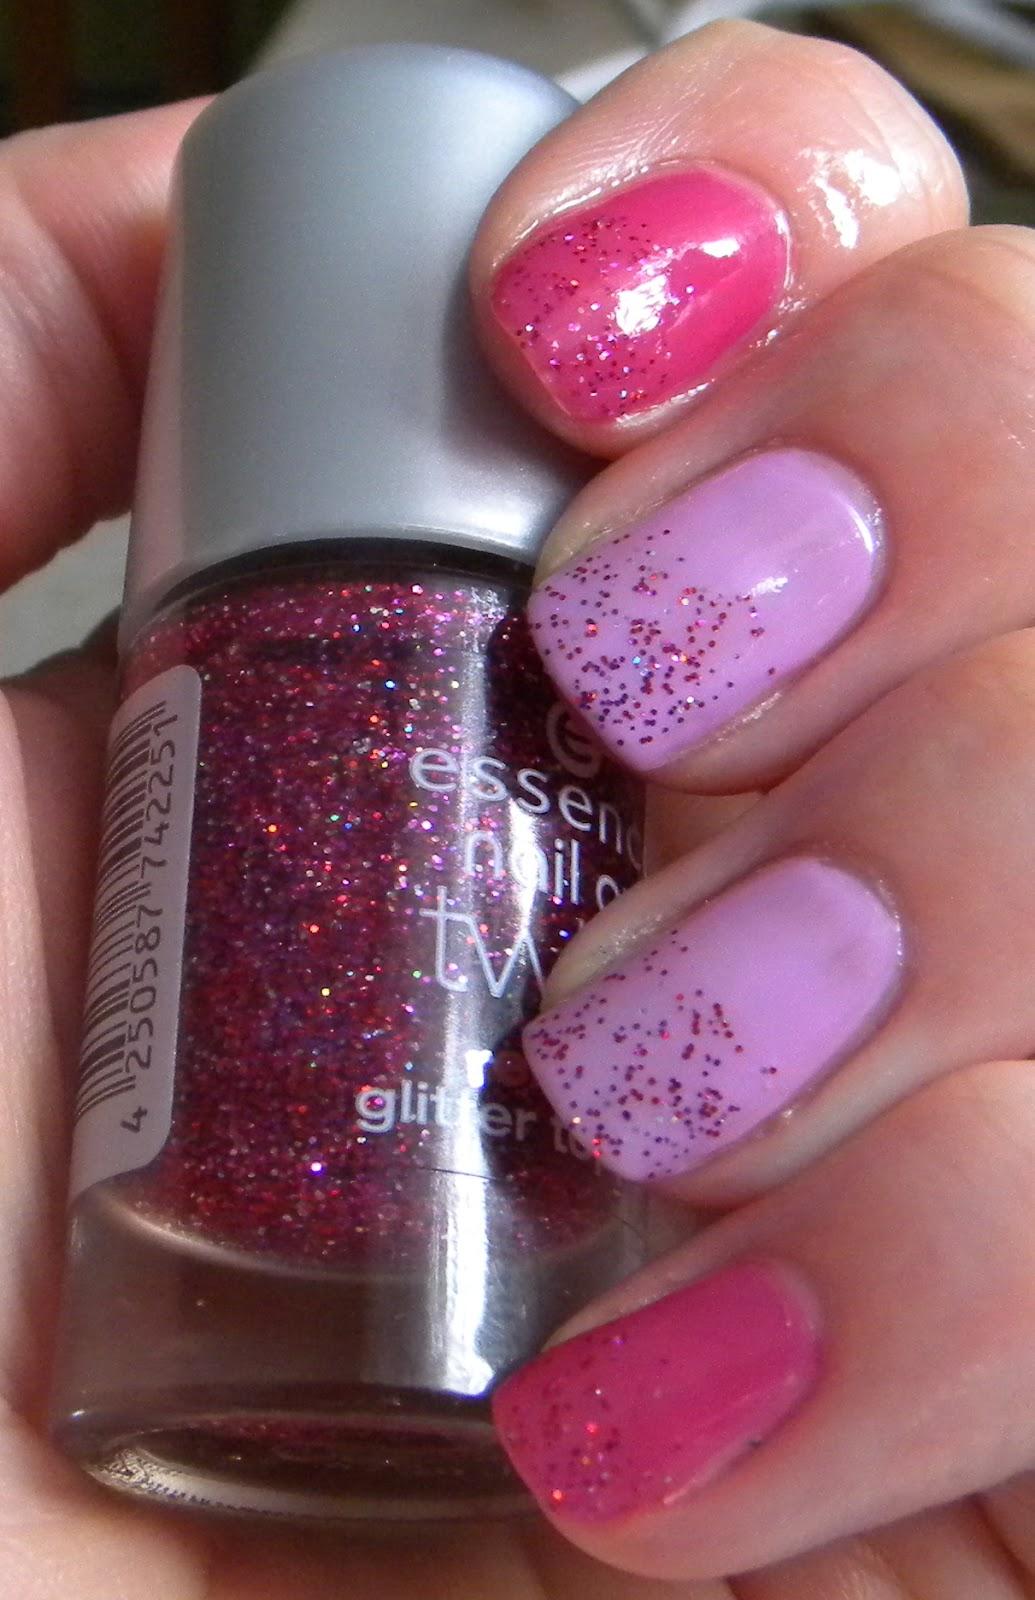 Essence Glitter Topper 03 mr big